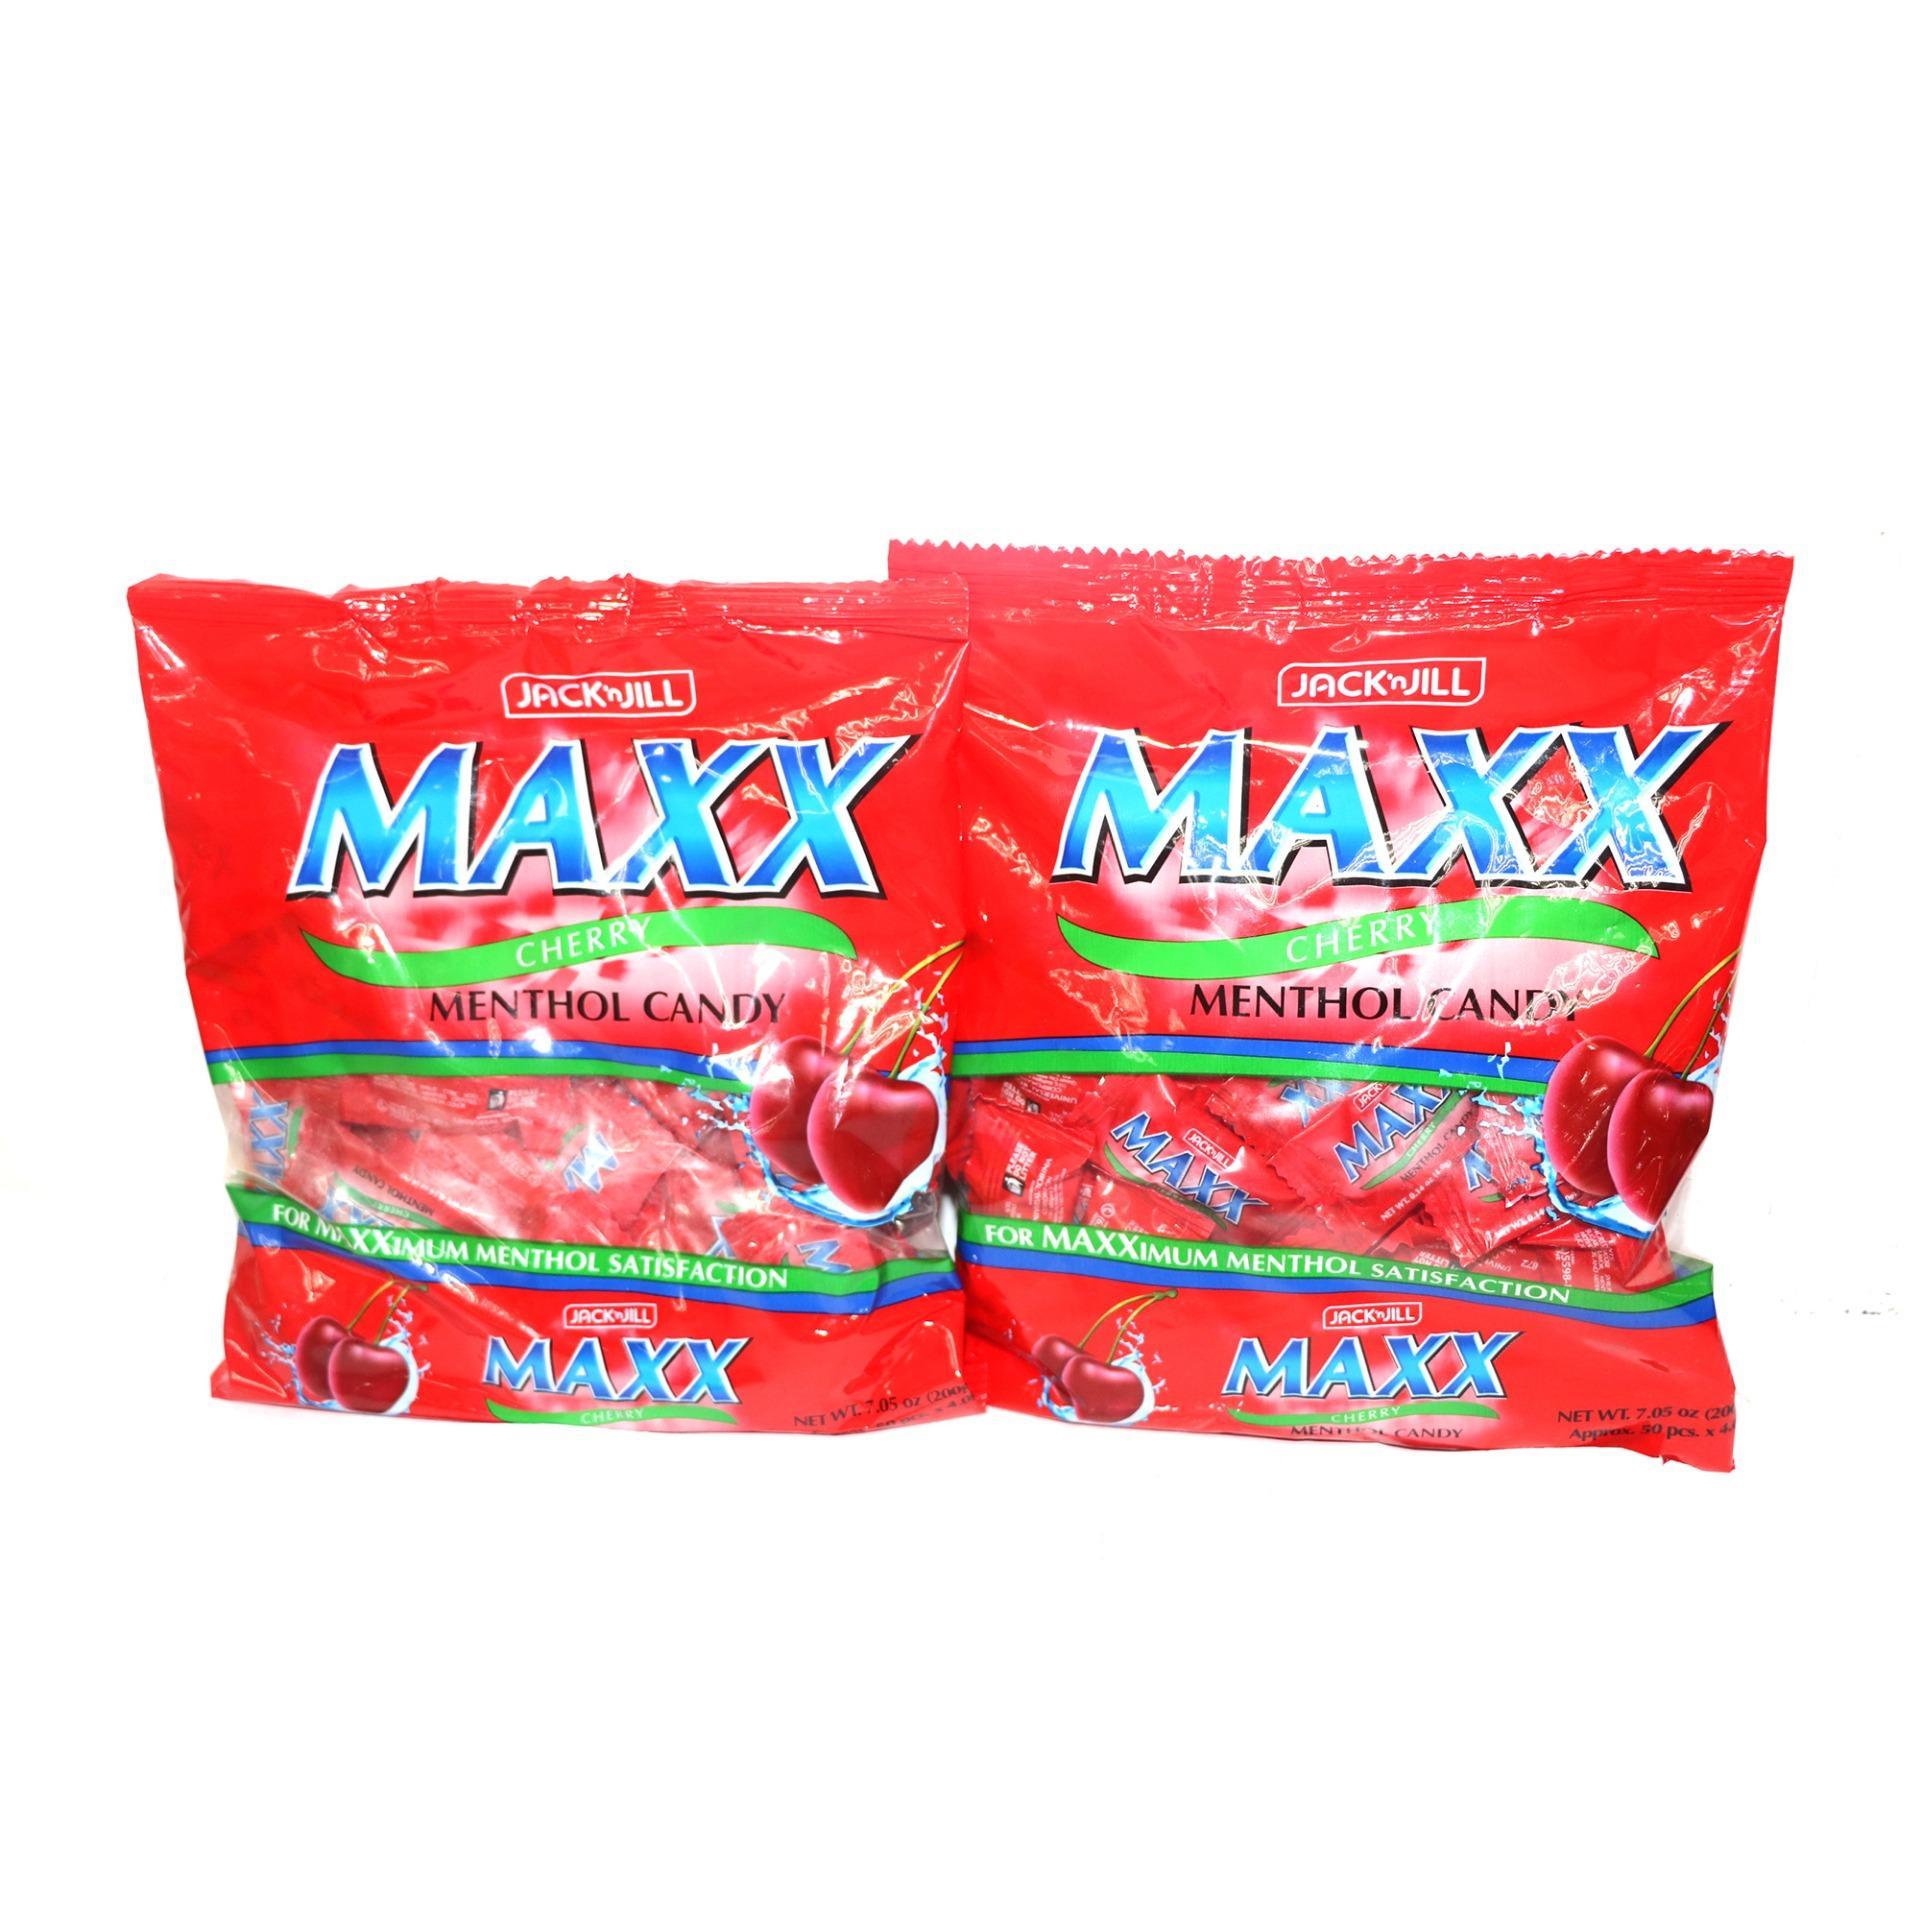 Candy Assortments Brands Assorted Bags On Sale Prices Set Jill Beauty Lip Matte 01 Red Cherry Maxx Menthol 2pcs 50pcs W92 304019